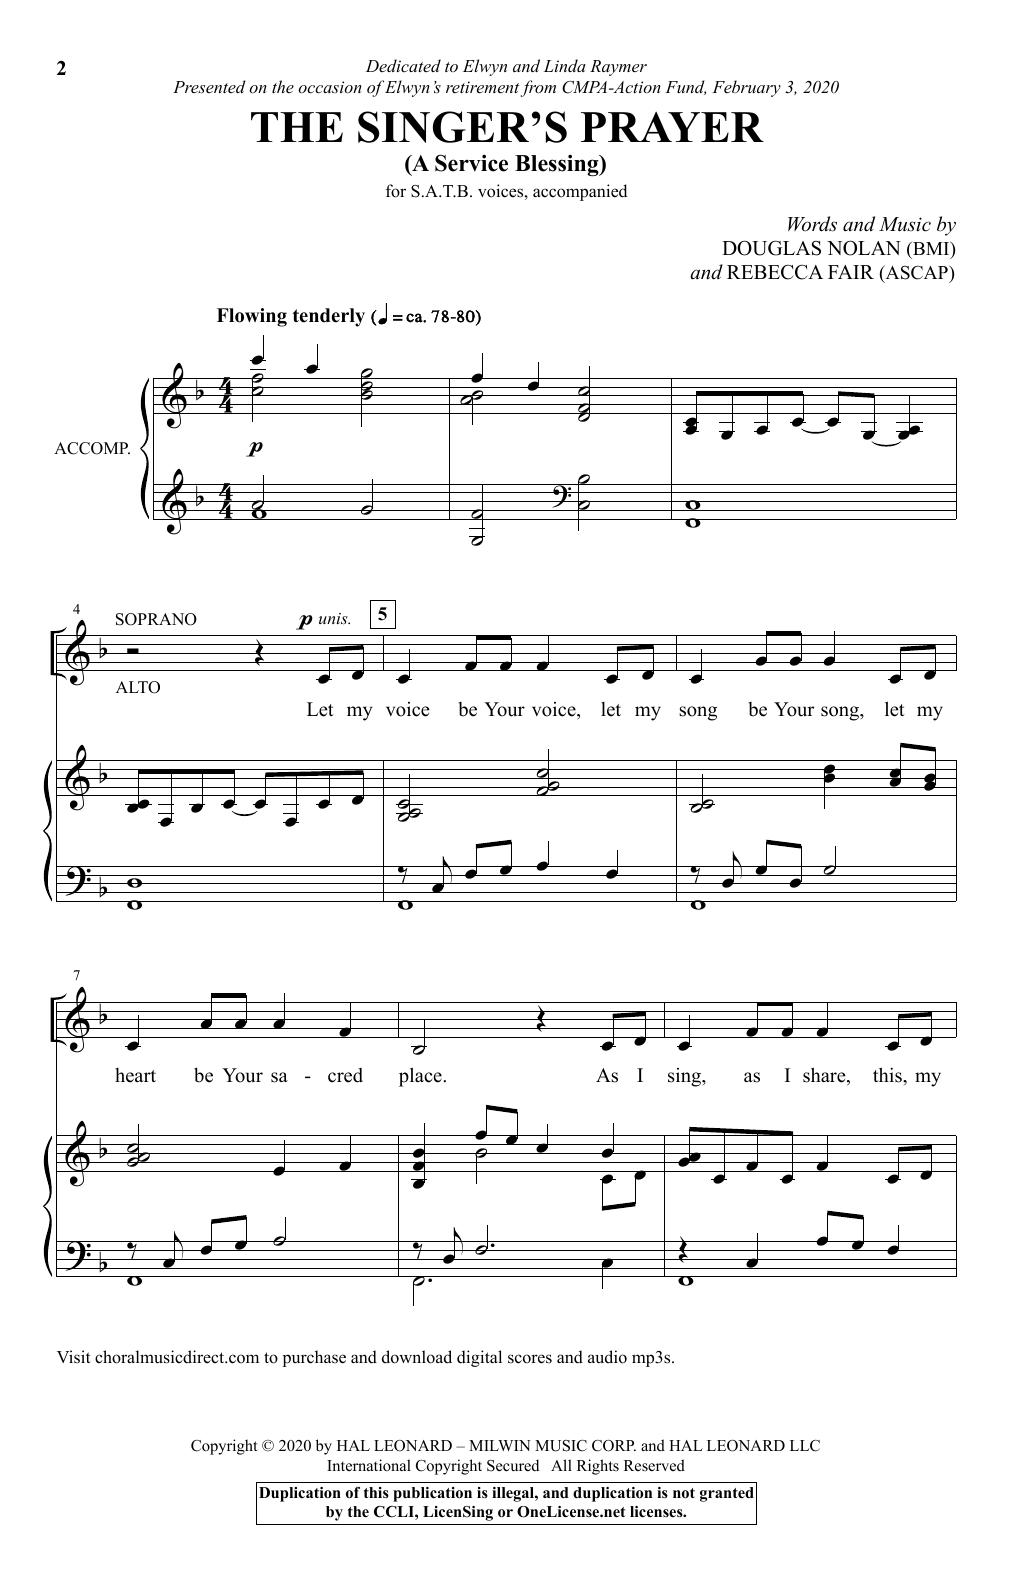 The Singer's Prayer (arr. Douglas Nolan) (SATB Choir)